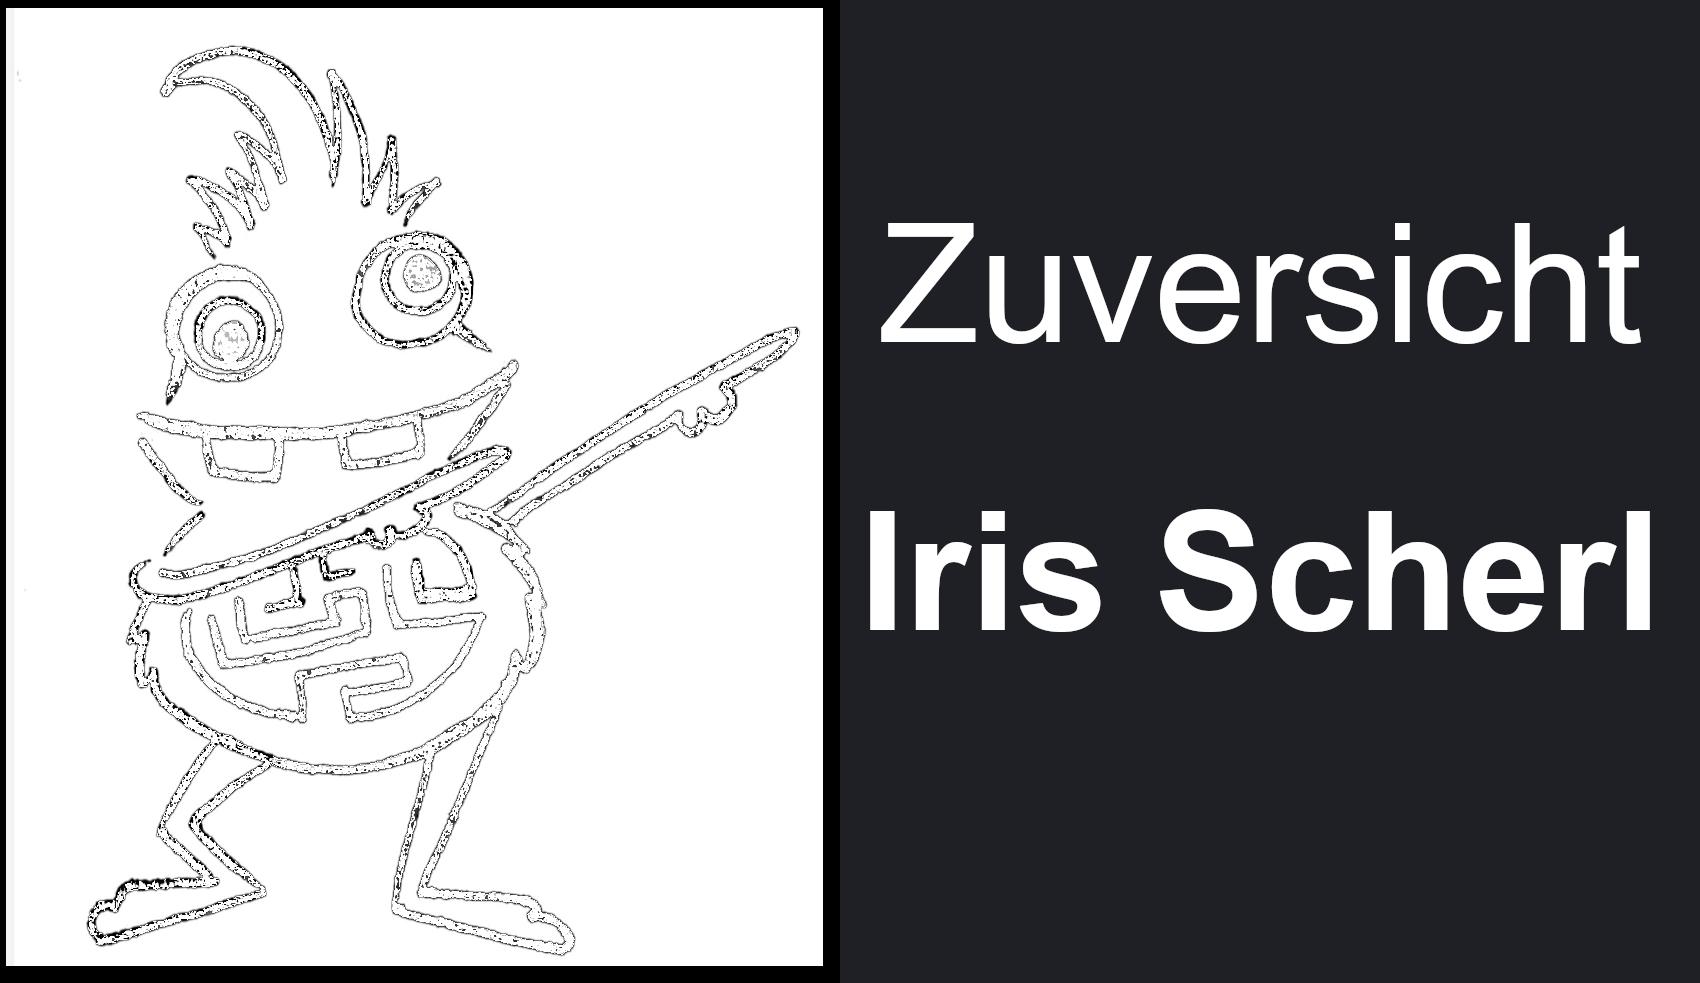 logo_zuversicht_hp2